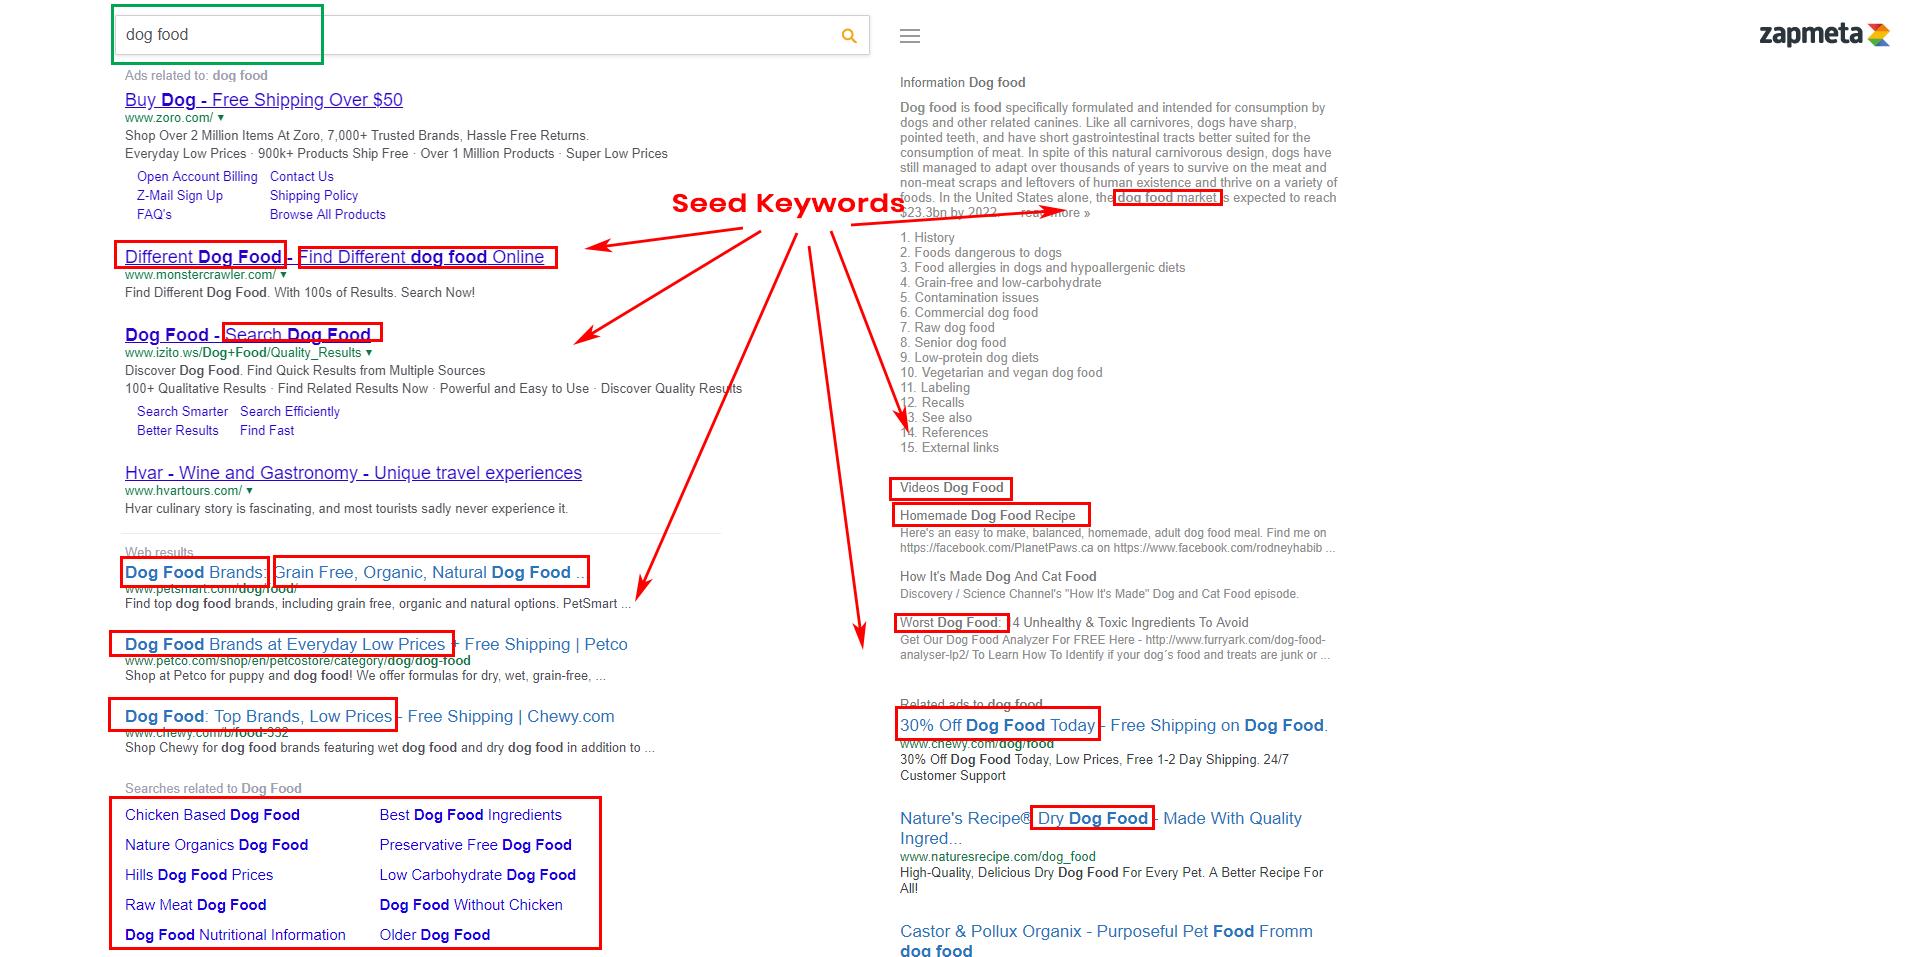 Keyword Research - Zapmeta Seed Keywords